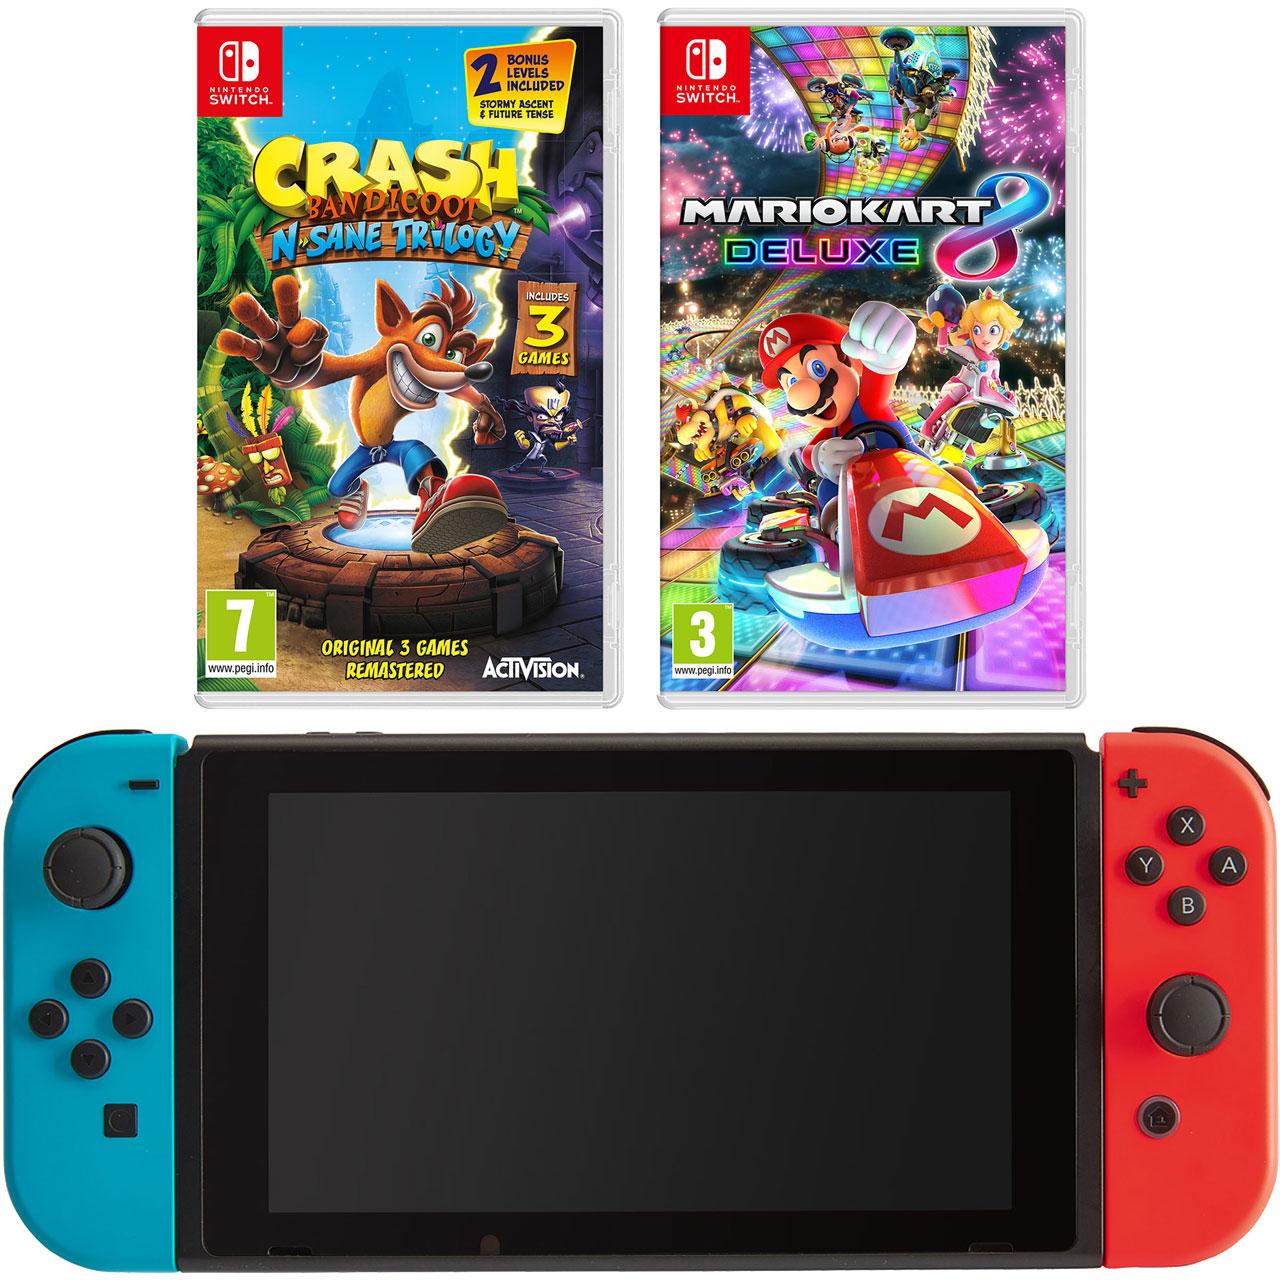 Nsheadcst55507 Nintendo Switch Mario Kart Bundle Grey Without Game